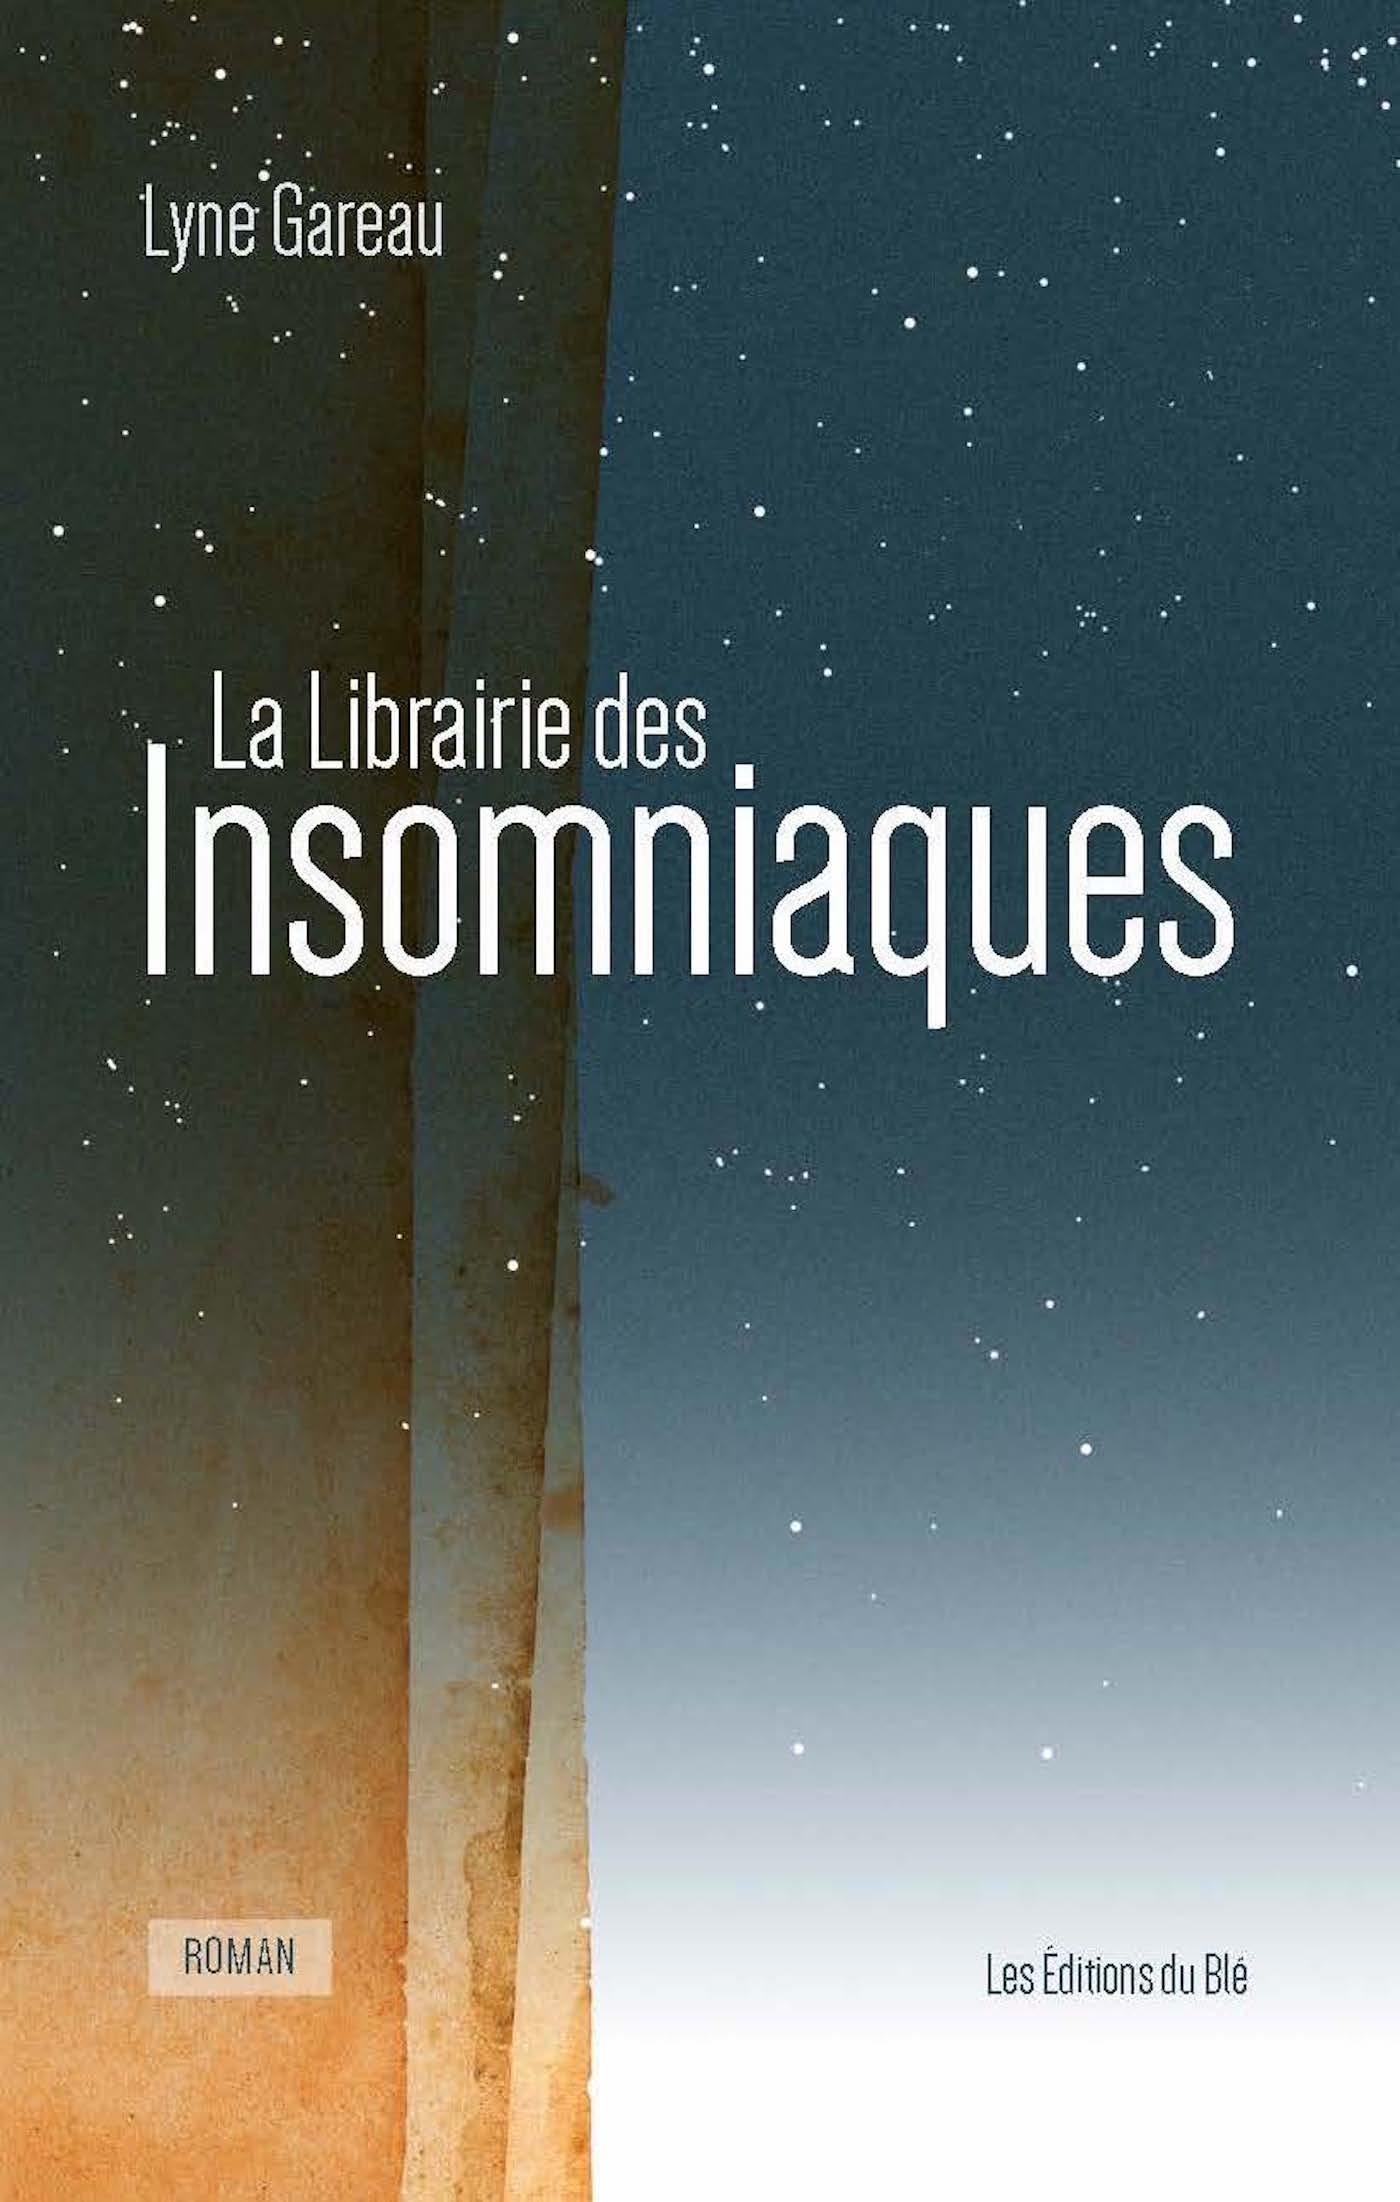 La Librairie des Insomniaques